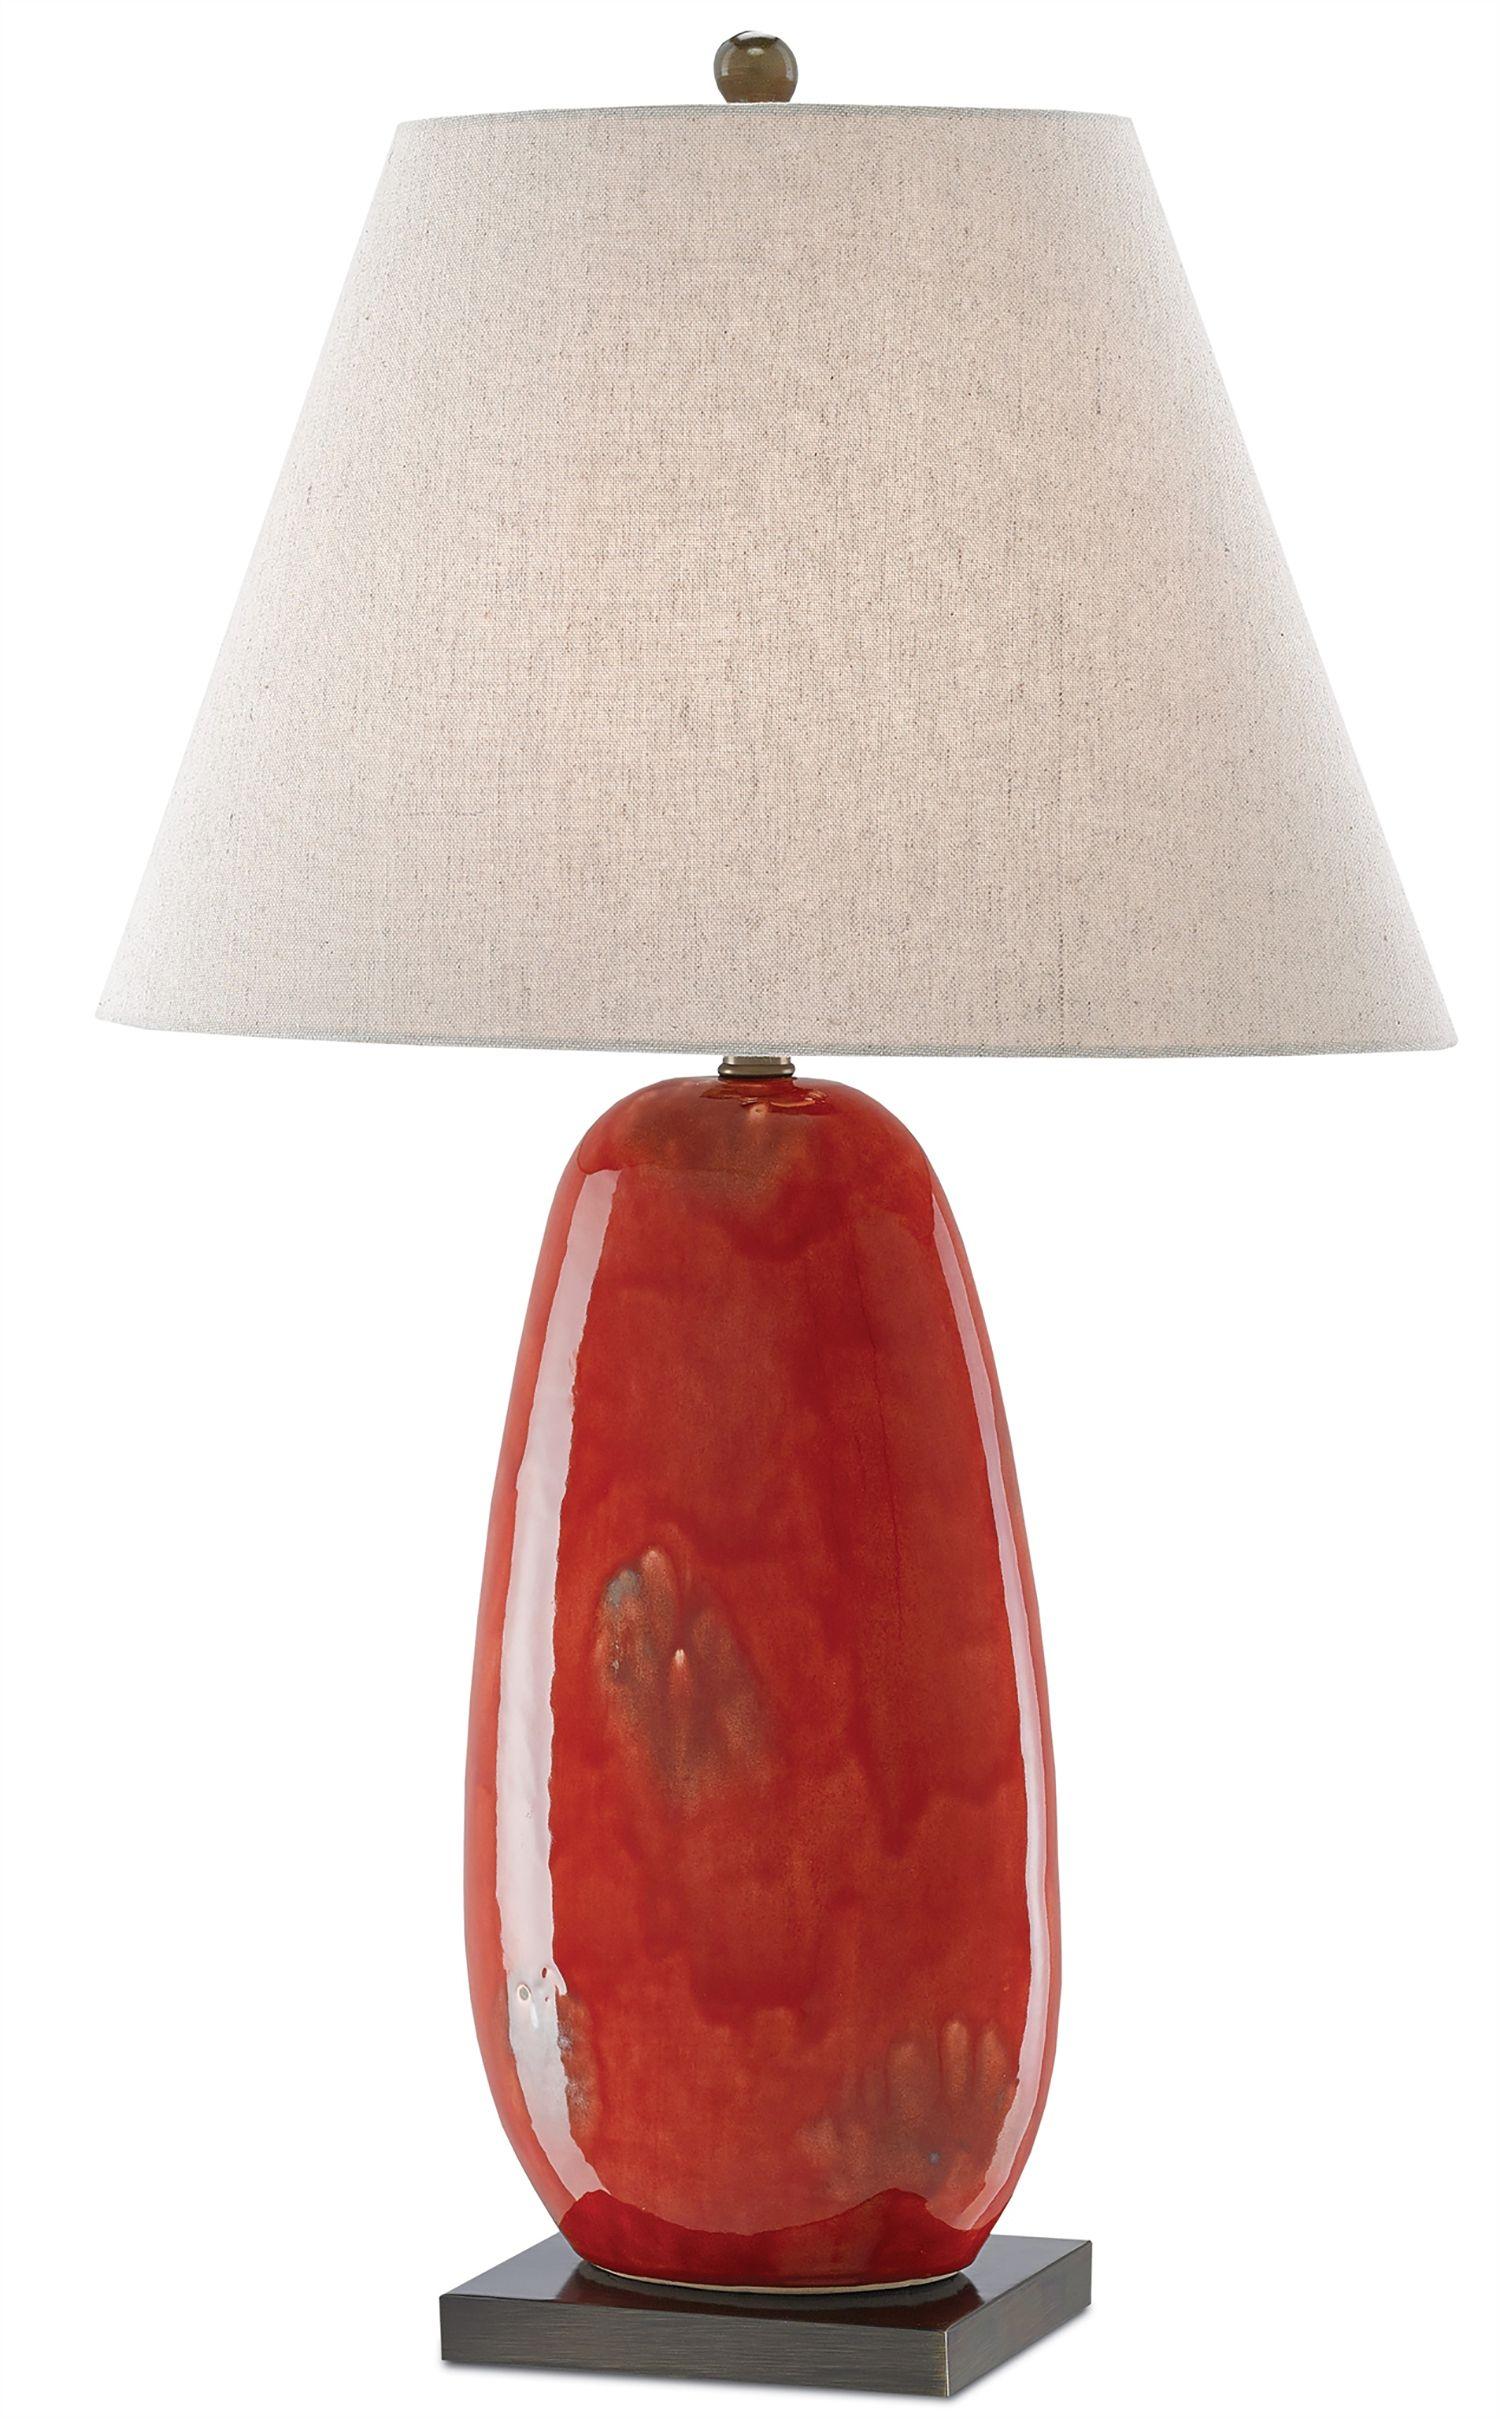 Carnelia Table Lamp | Lamp, Table lamp, Rustic table lamps